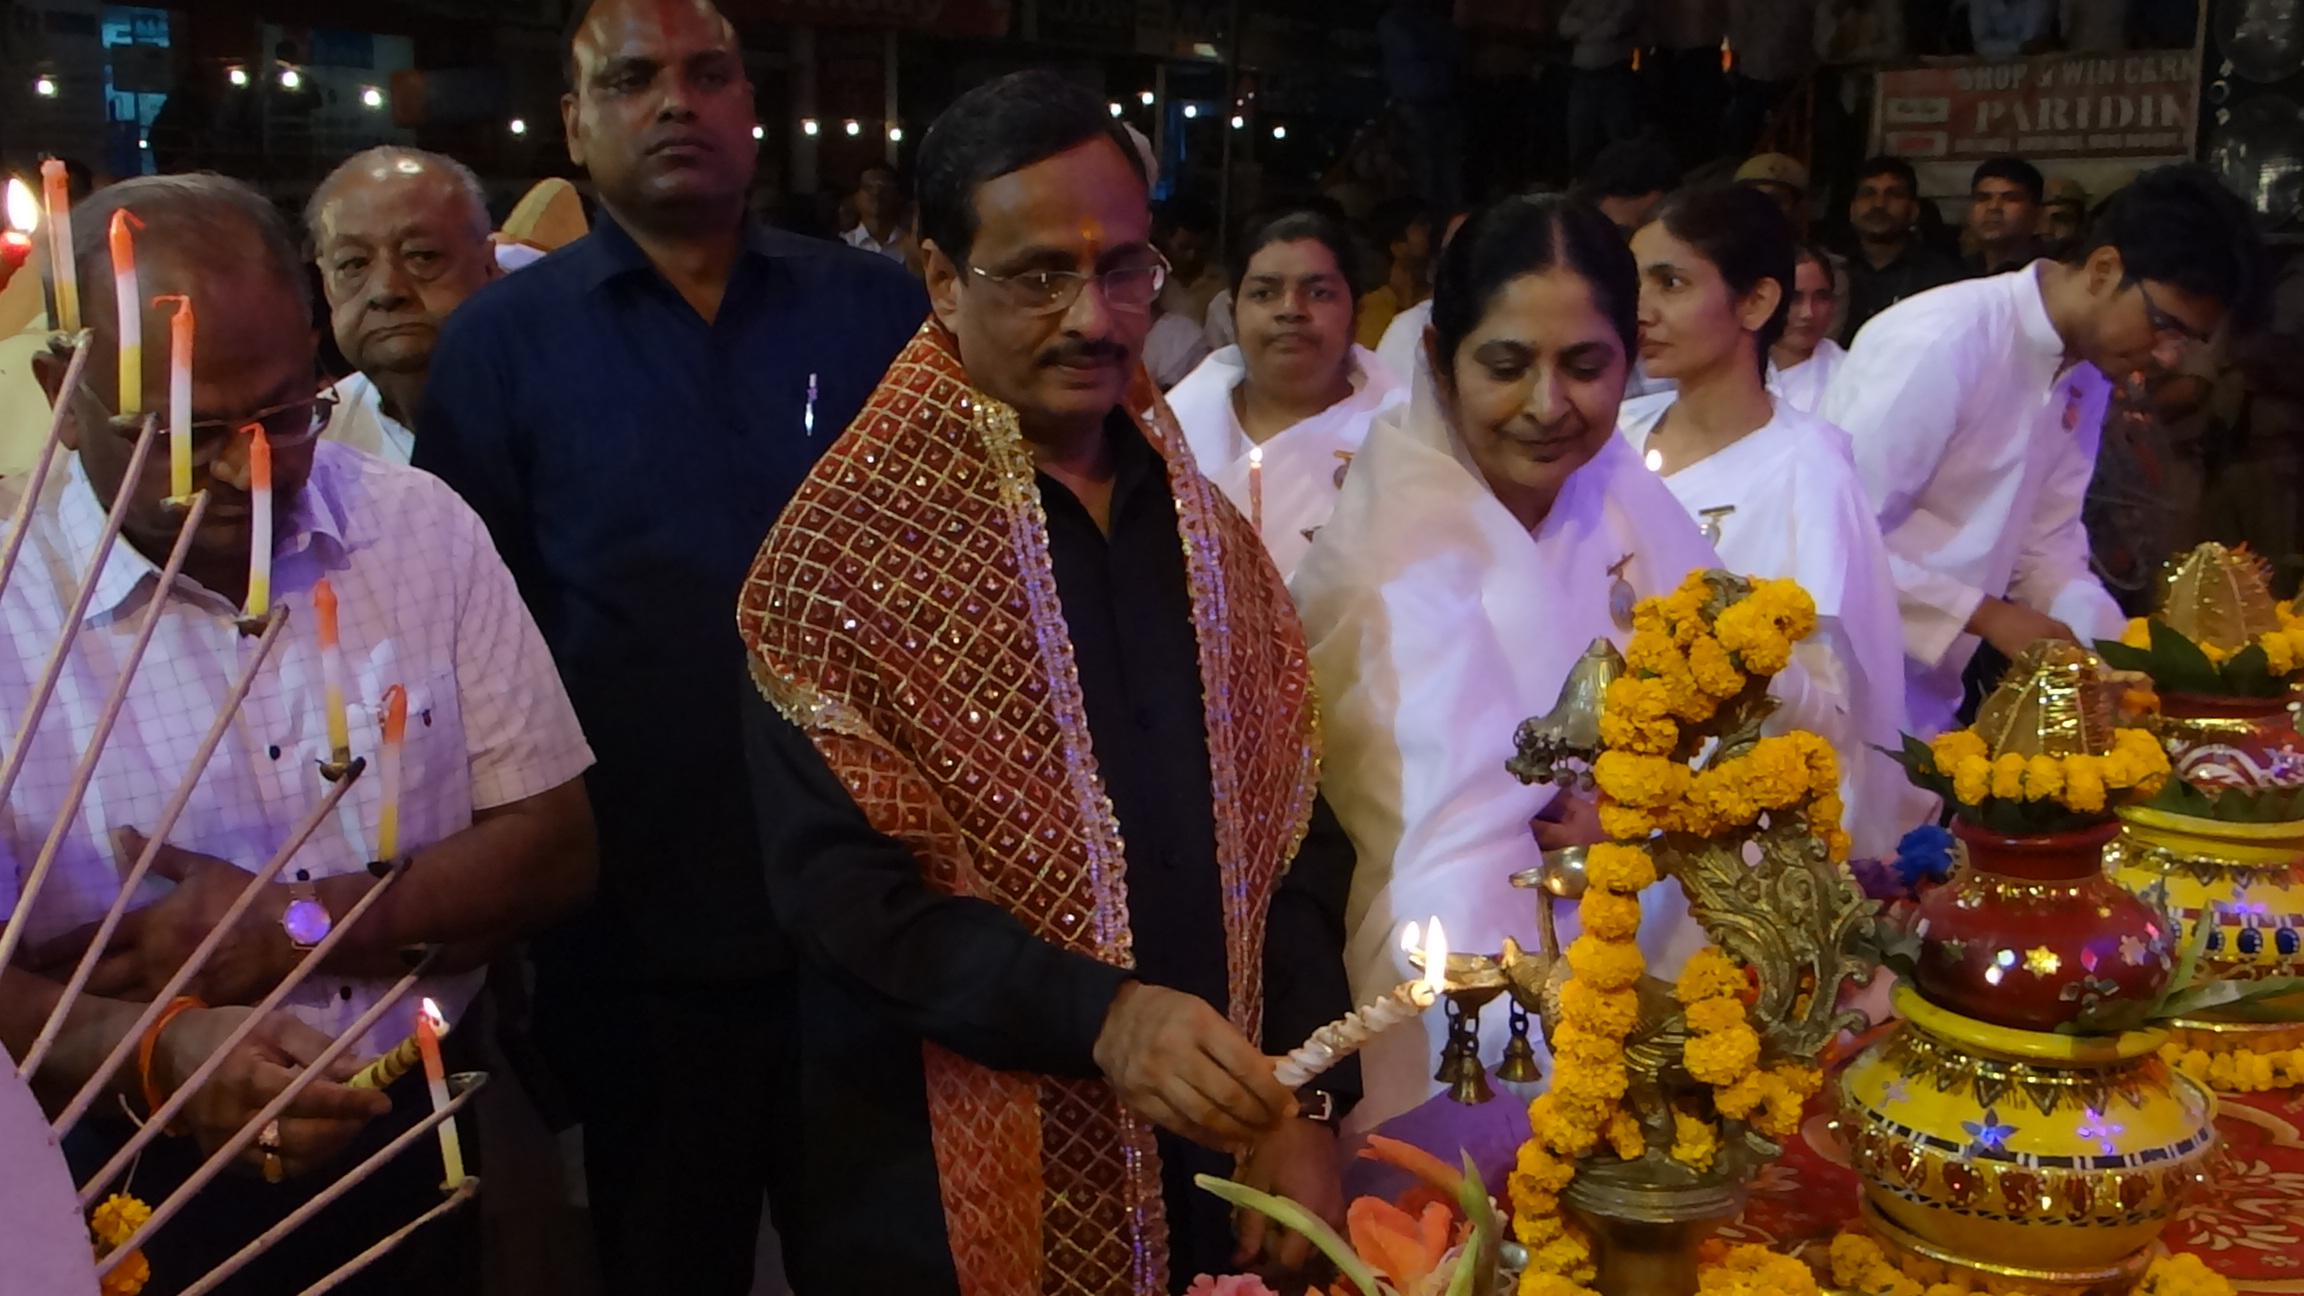 Deputy Chief Minister and Ministers of Uttar Pradesh Praise Brahma Kumaris in Lucknow